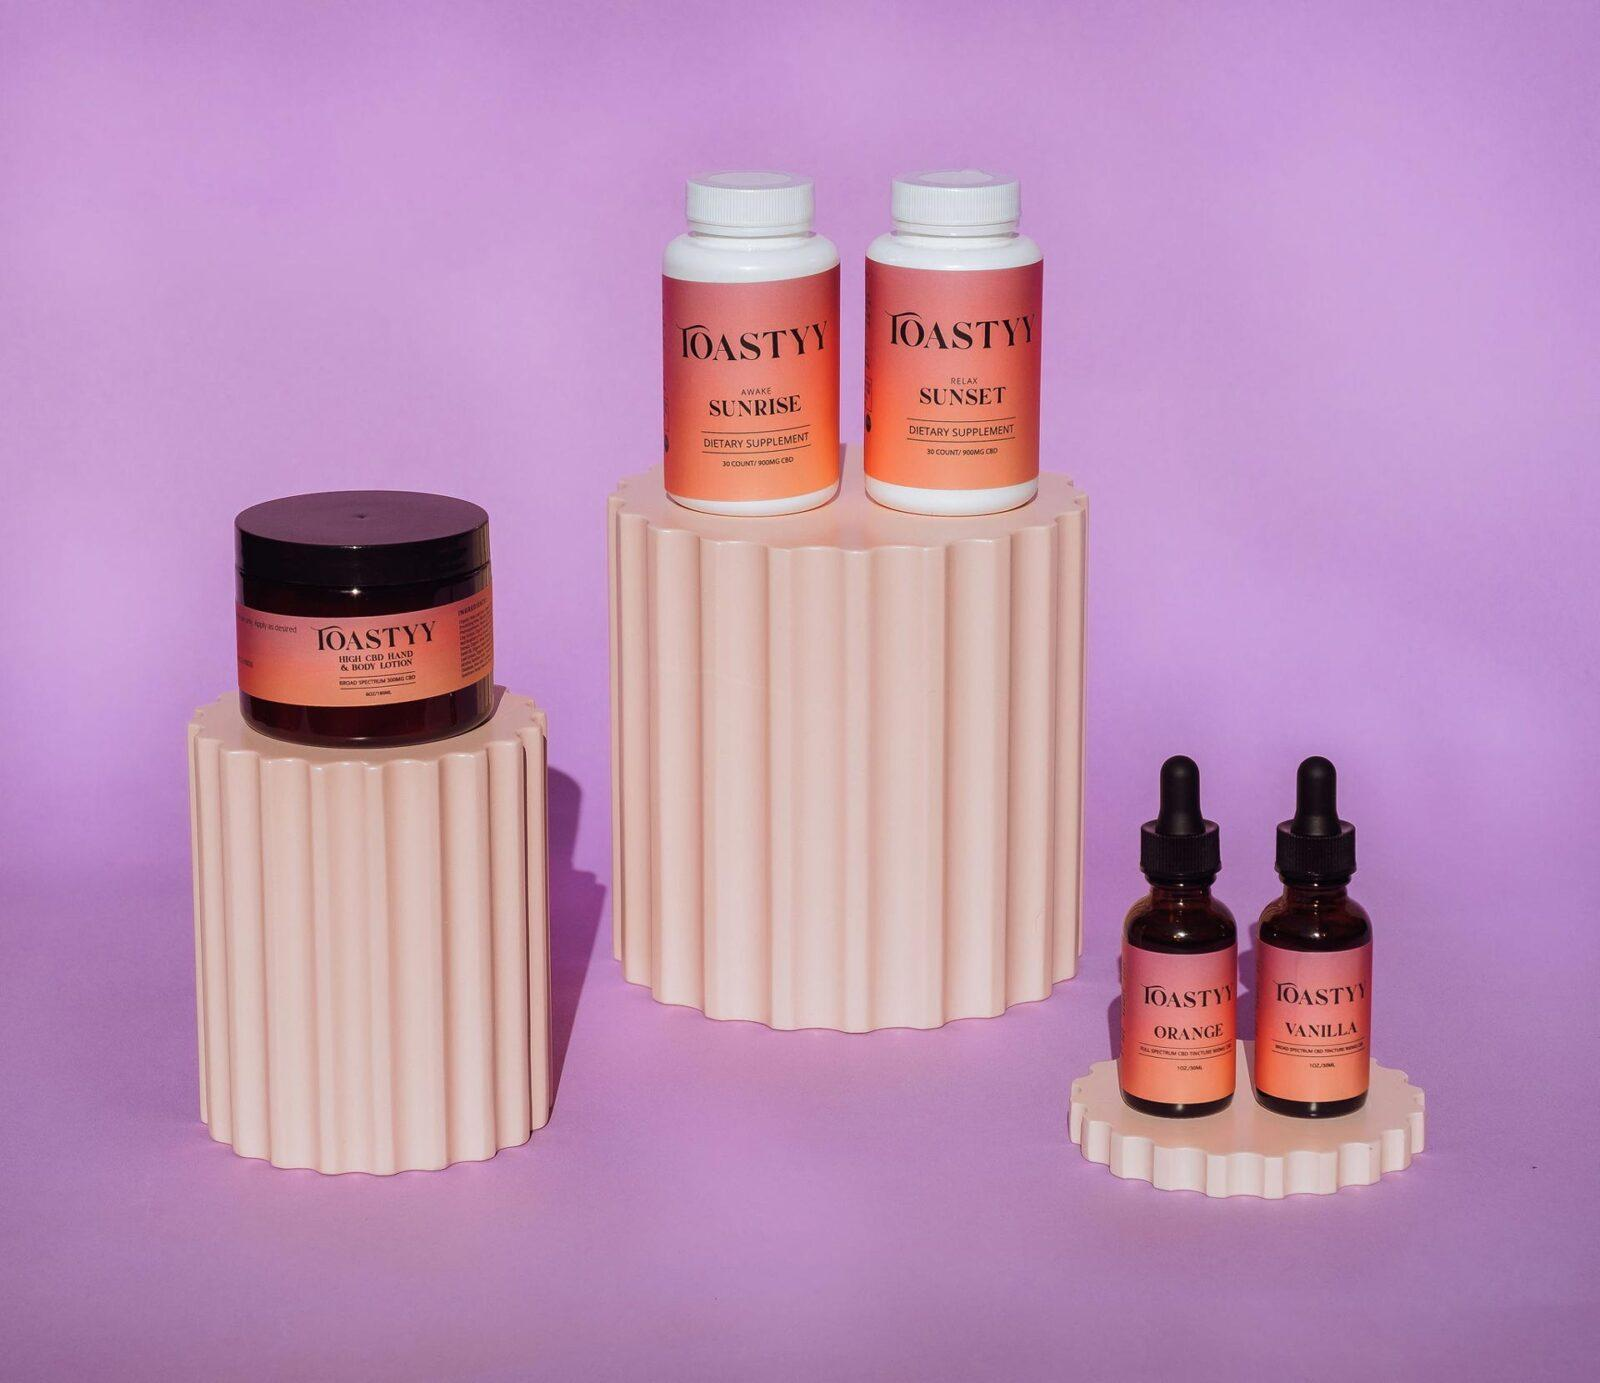 toastyy cbd wellness products